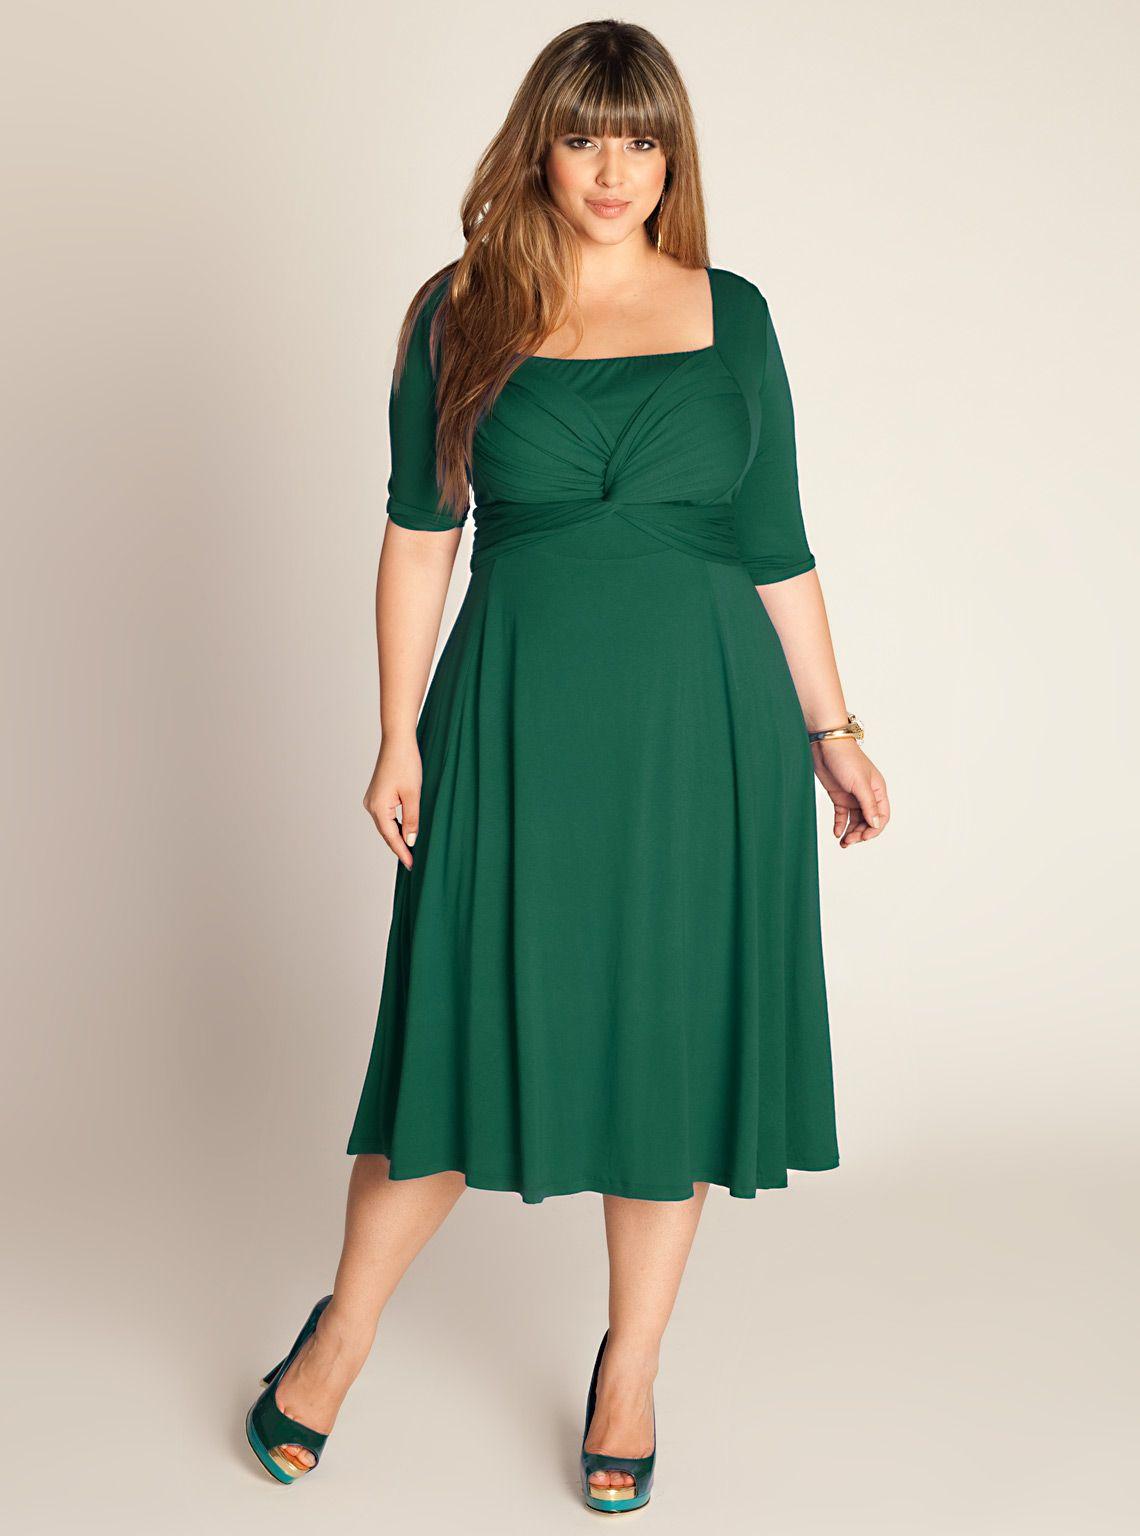 Park Art My WordPress Blog_Green Wrap Dress Plus Size